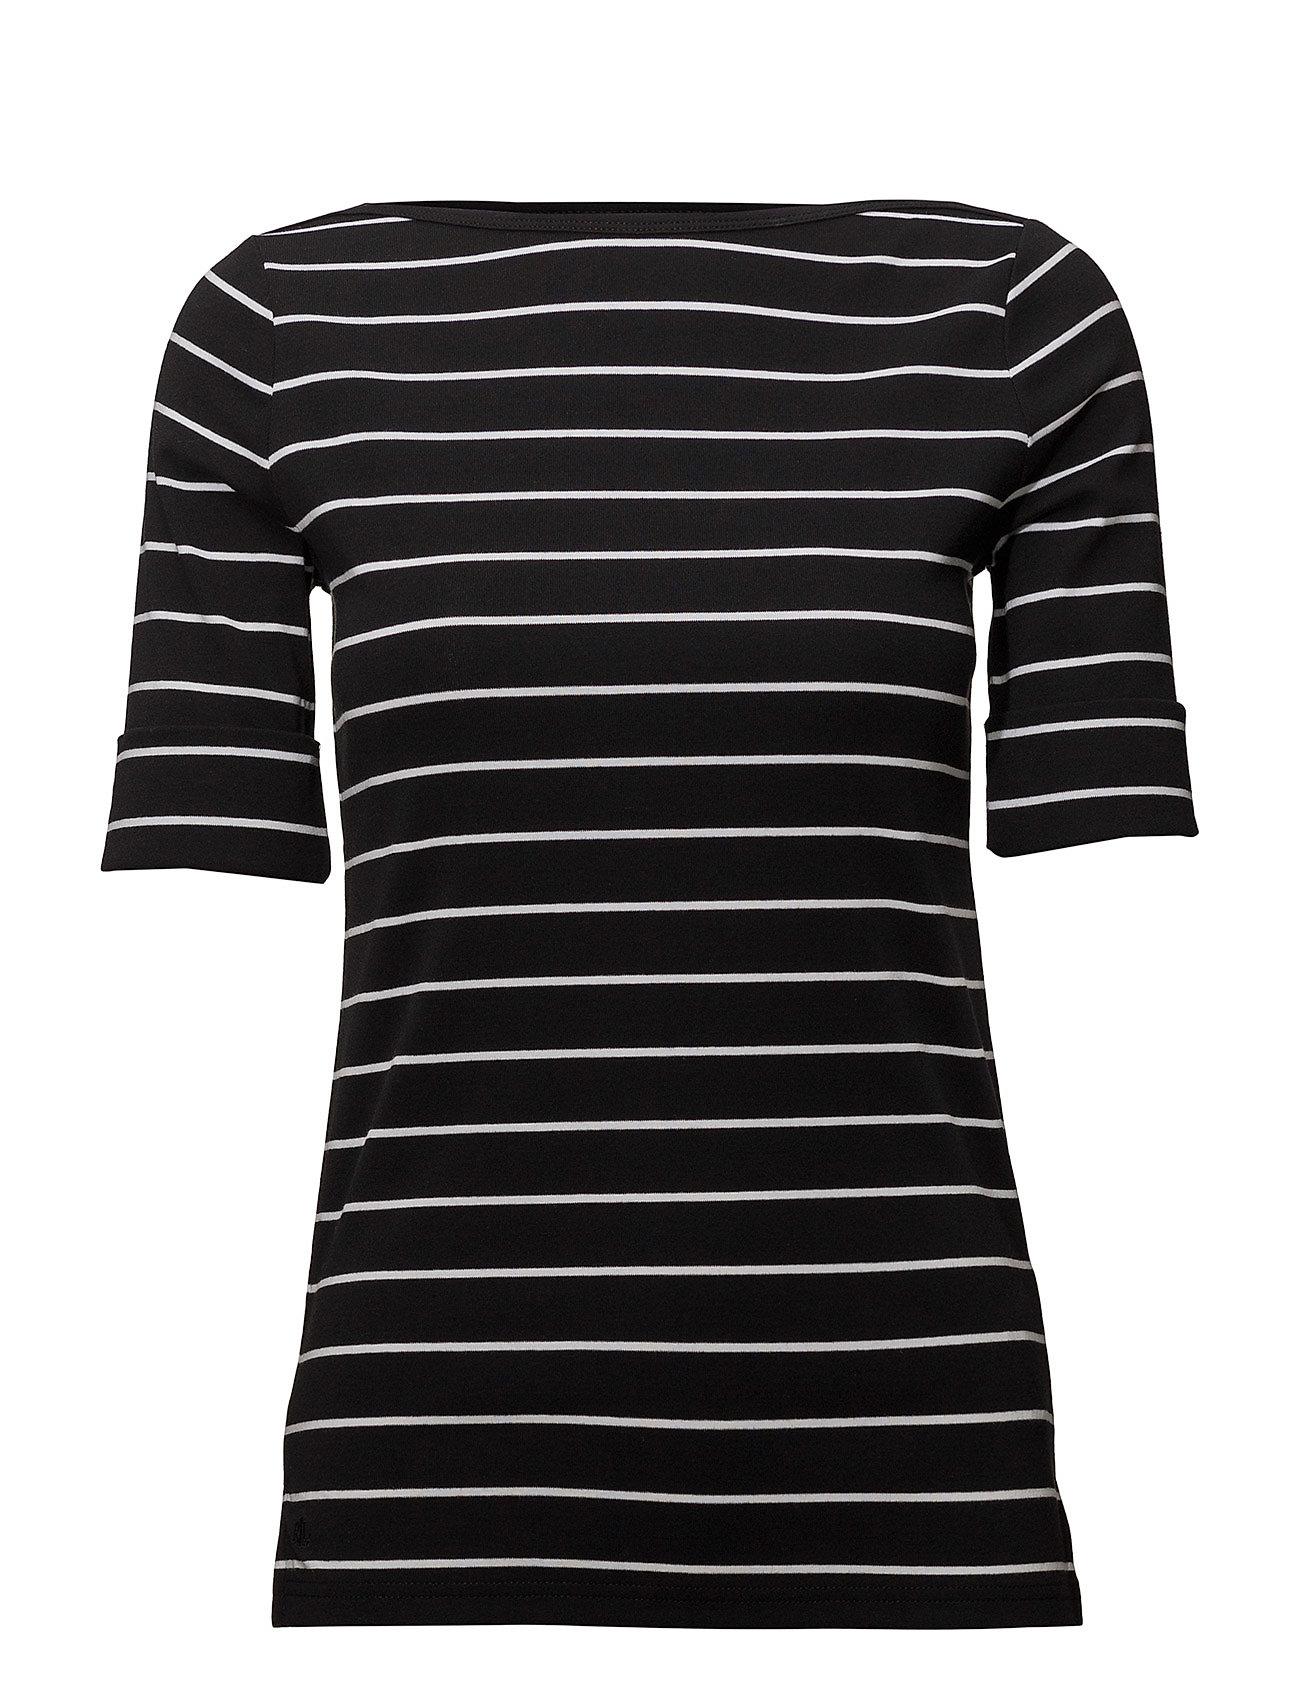 Lauren Ralph Lauren Knit Elbow-Length-Sleeve Top - POLO BLACK/WHITE